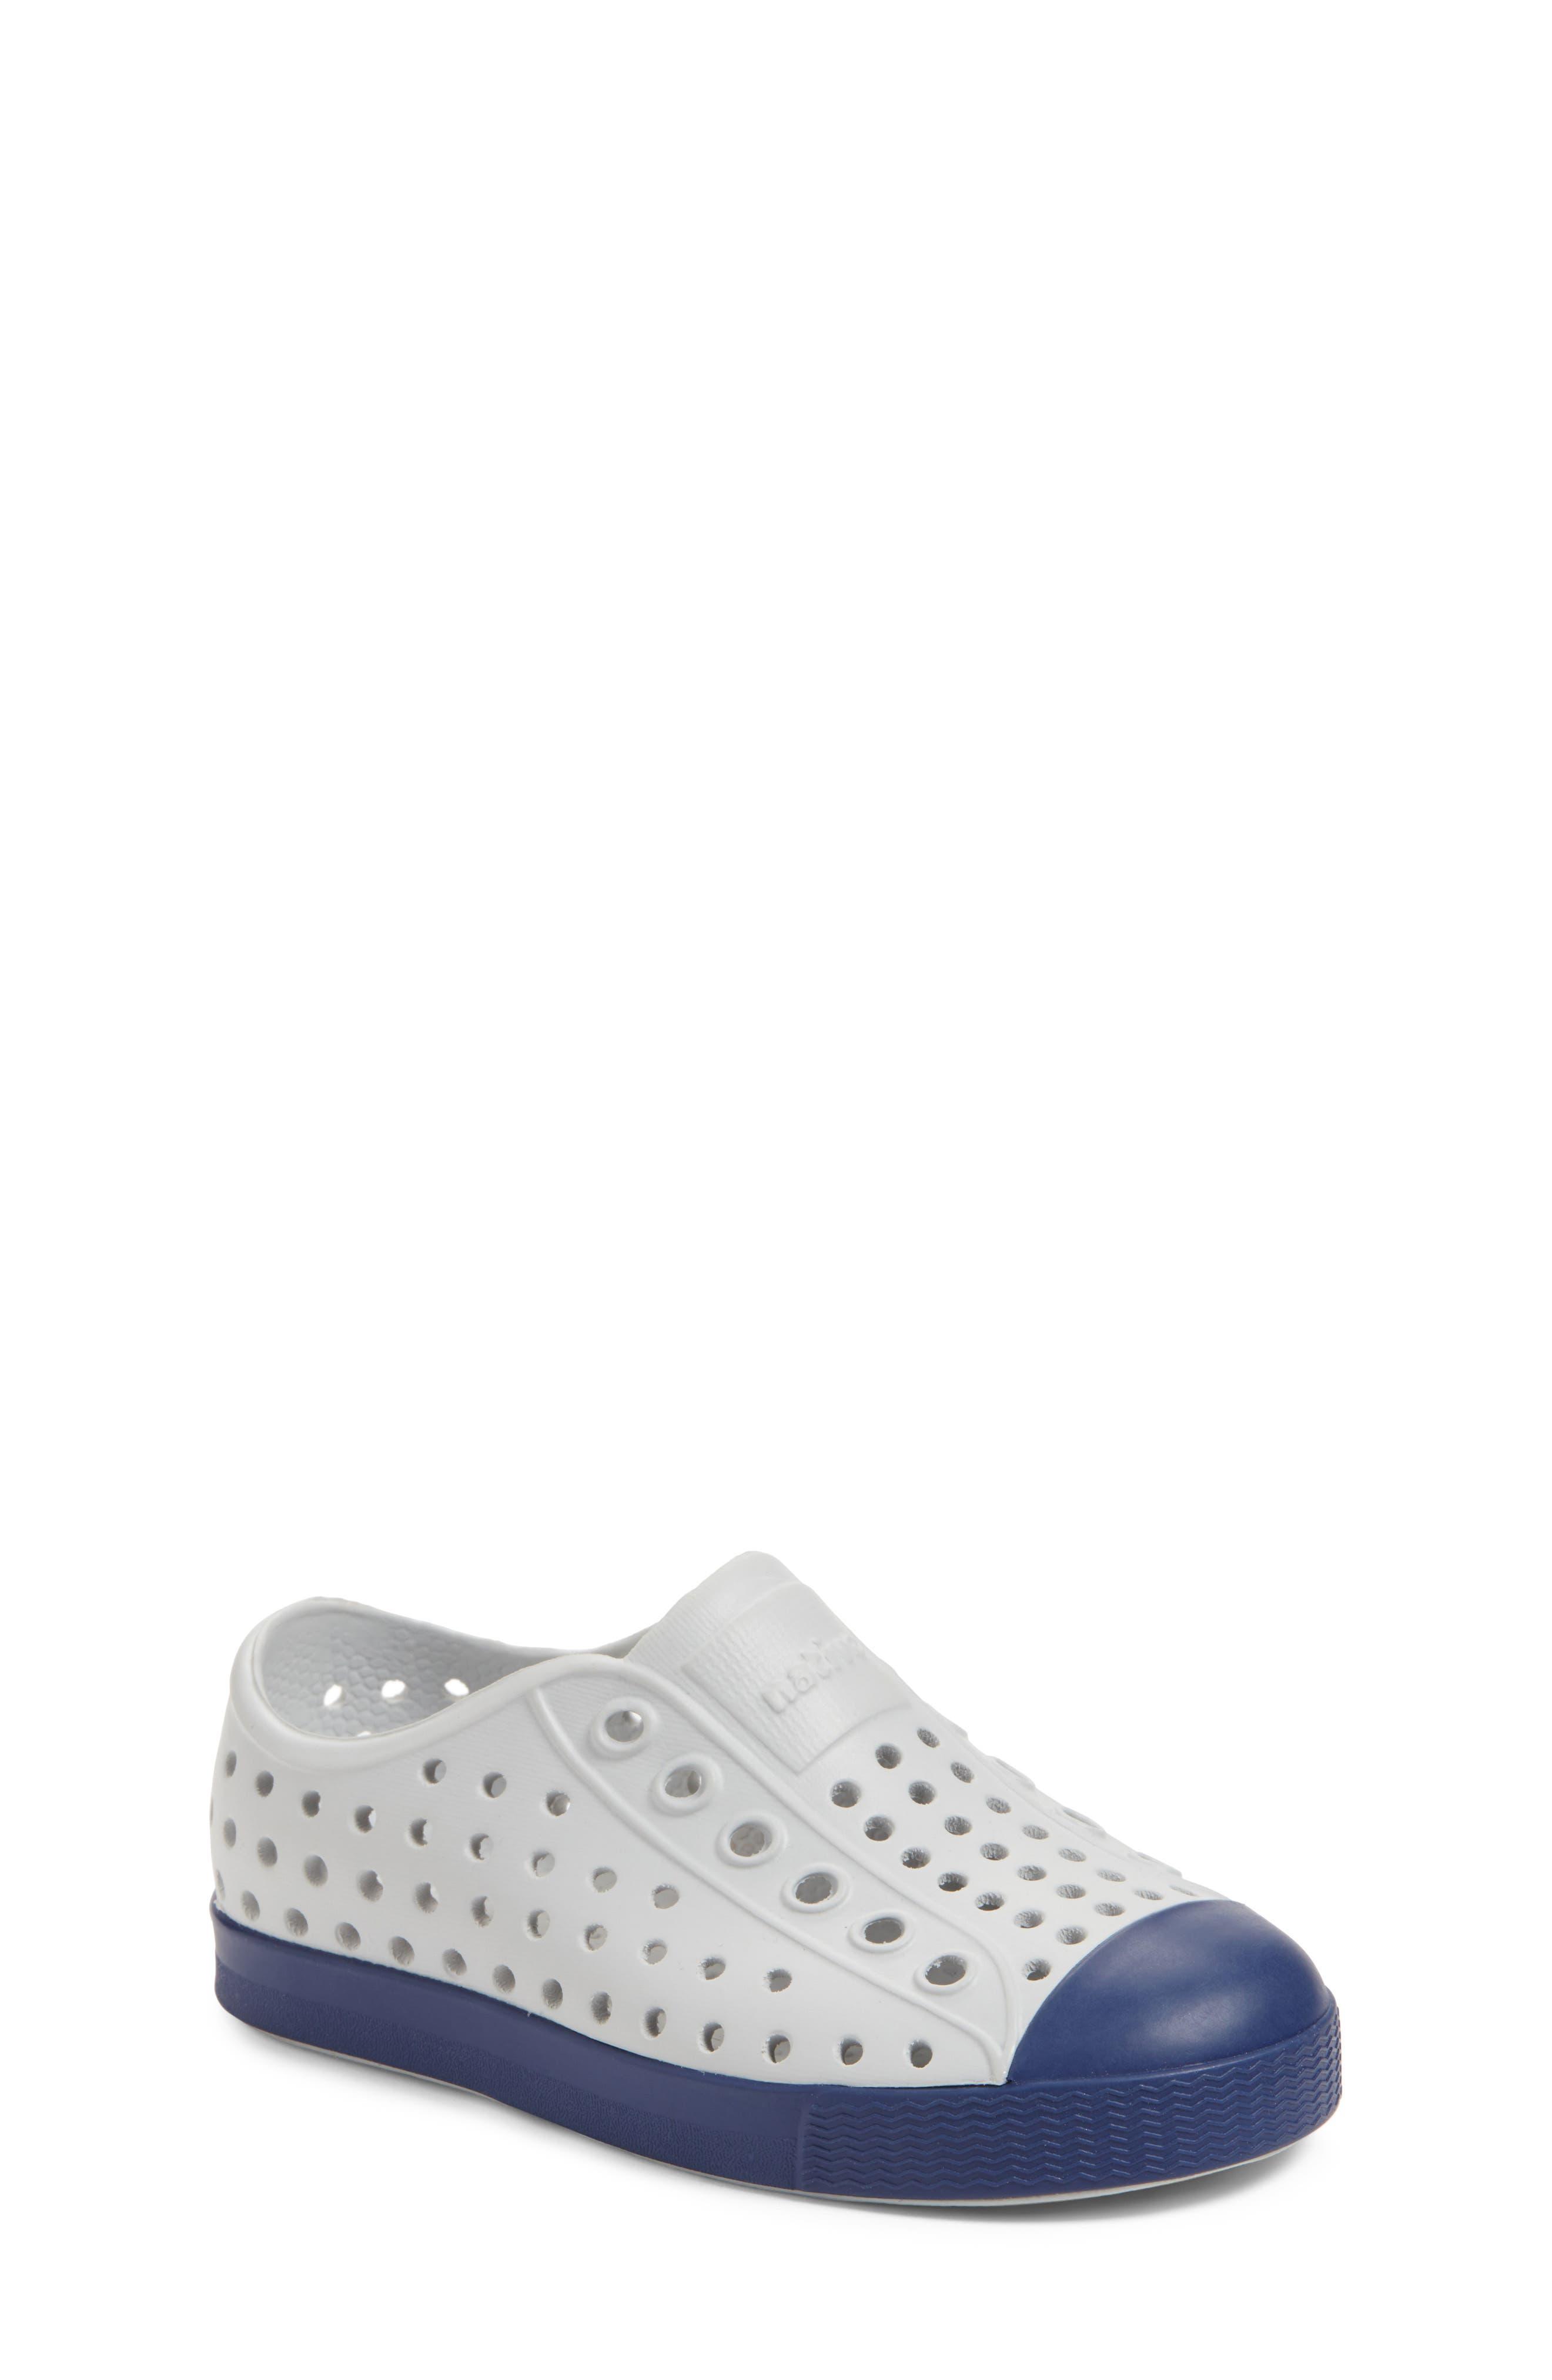 'Jefferson' Water Friendly Slip-On Sneaker,                             Main thumbnail 14, color,